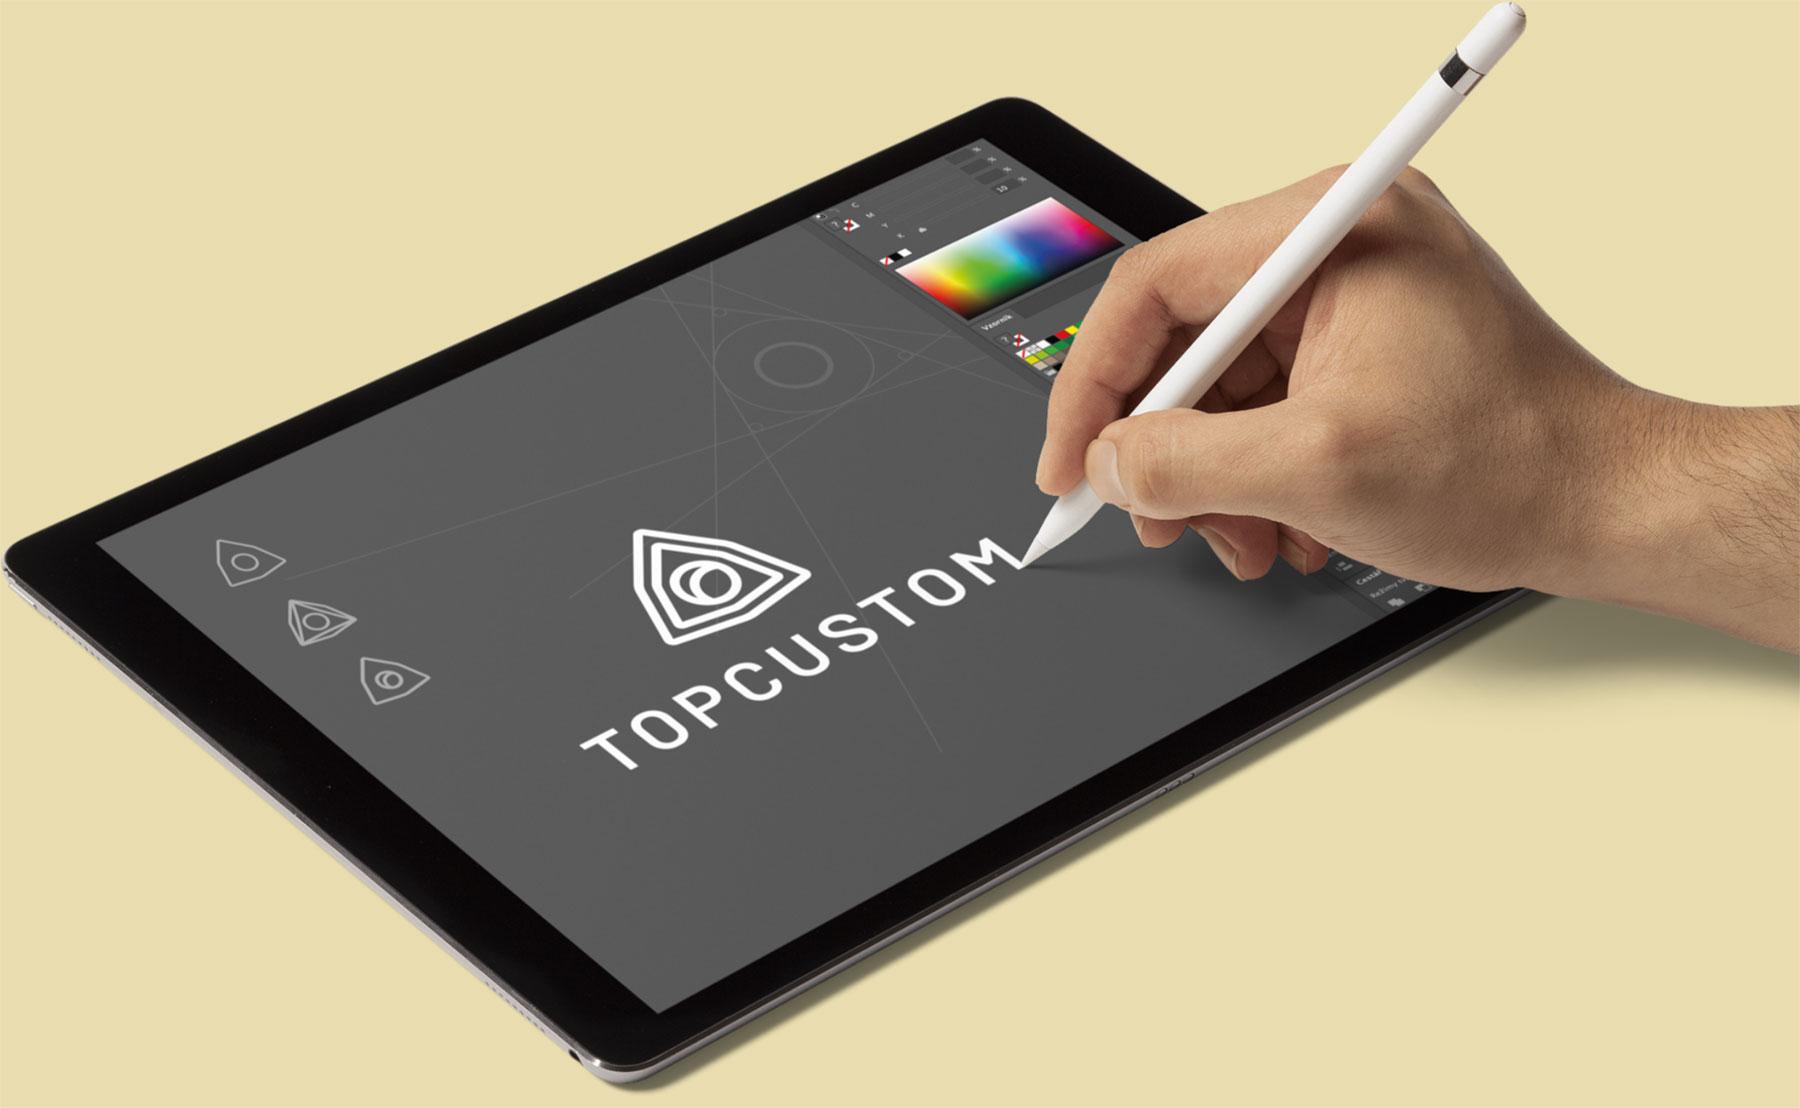 URVIHO - tvorba loga na iPadu